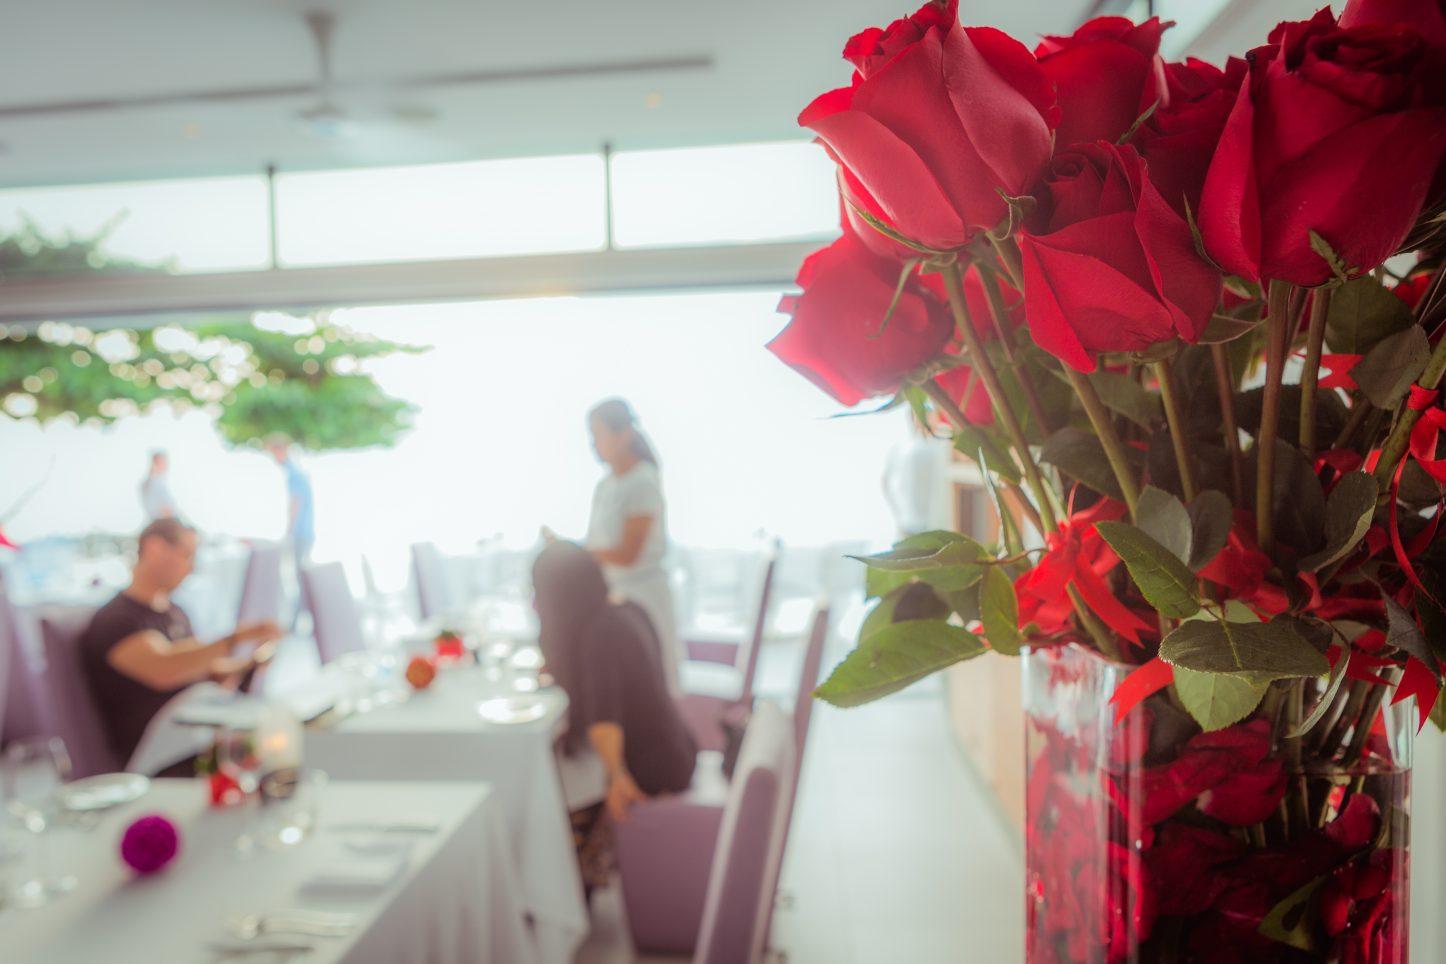 Phuket's most romantic valentines setting at Kata Rocks